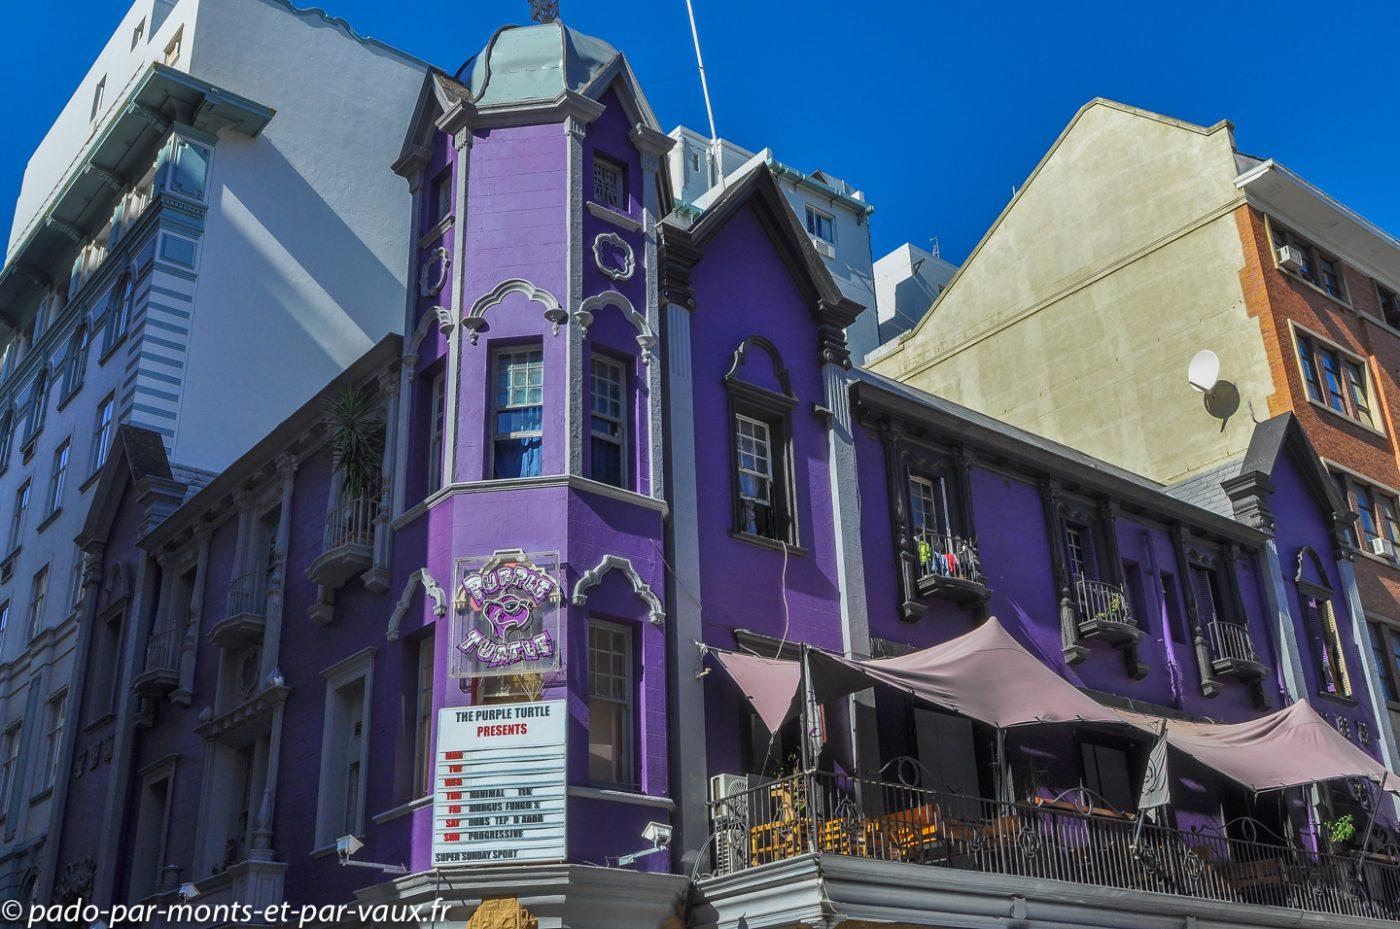 Cape Town - Long street